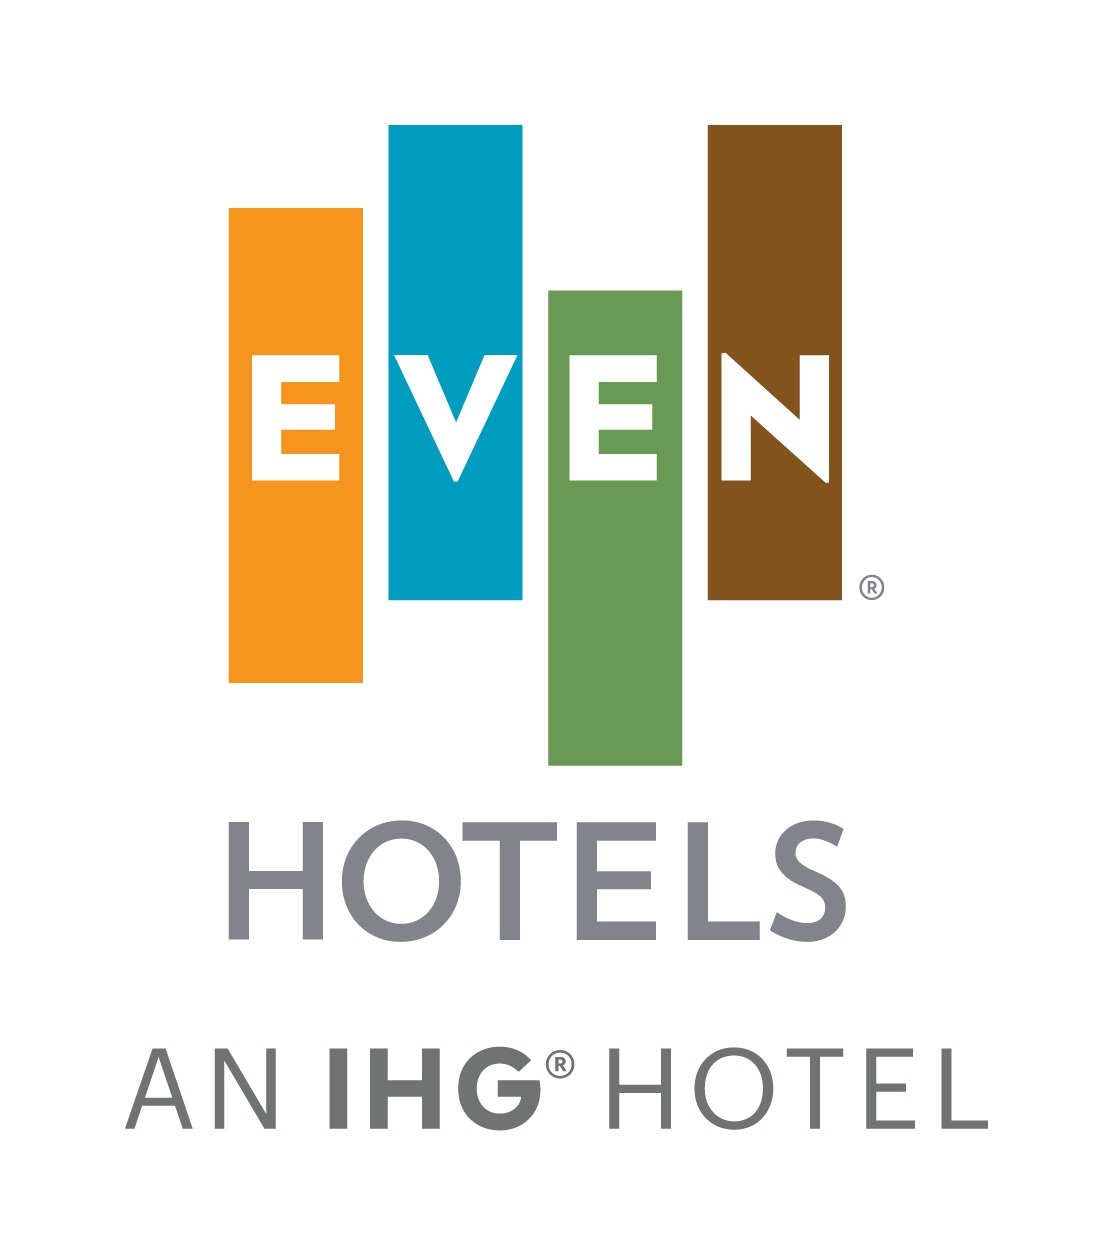 even-hotels-por-lkp-d-r-rgb-pos-2.jpg